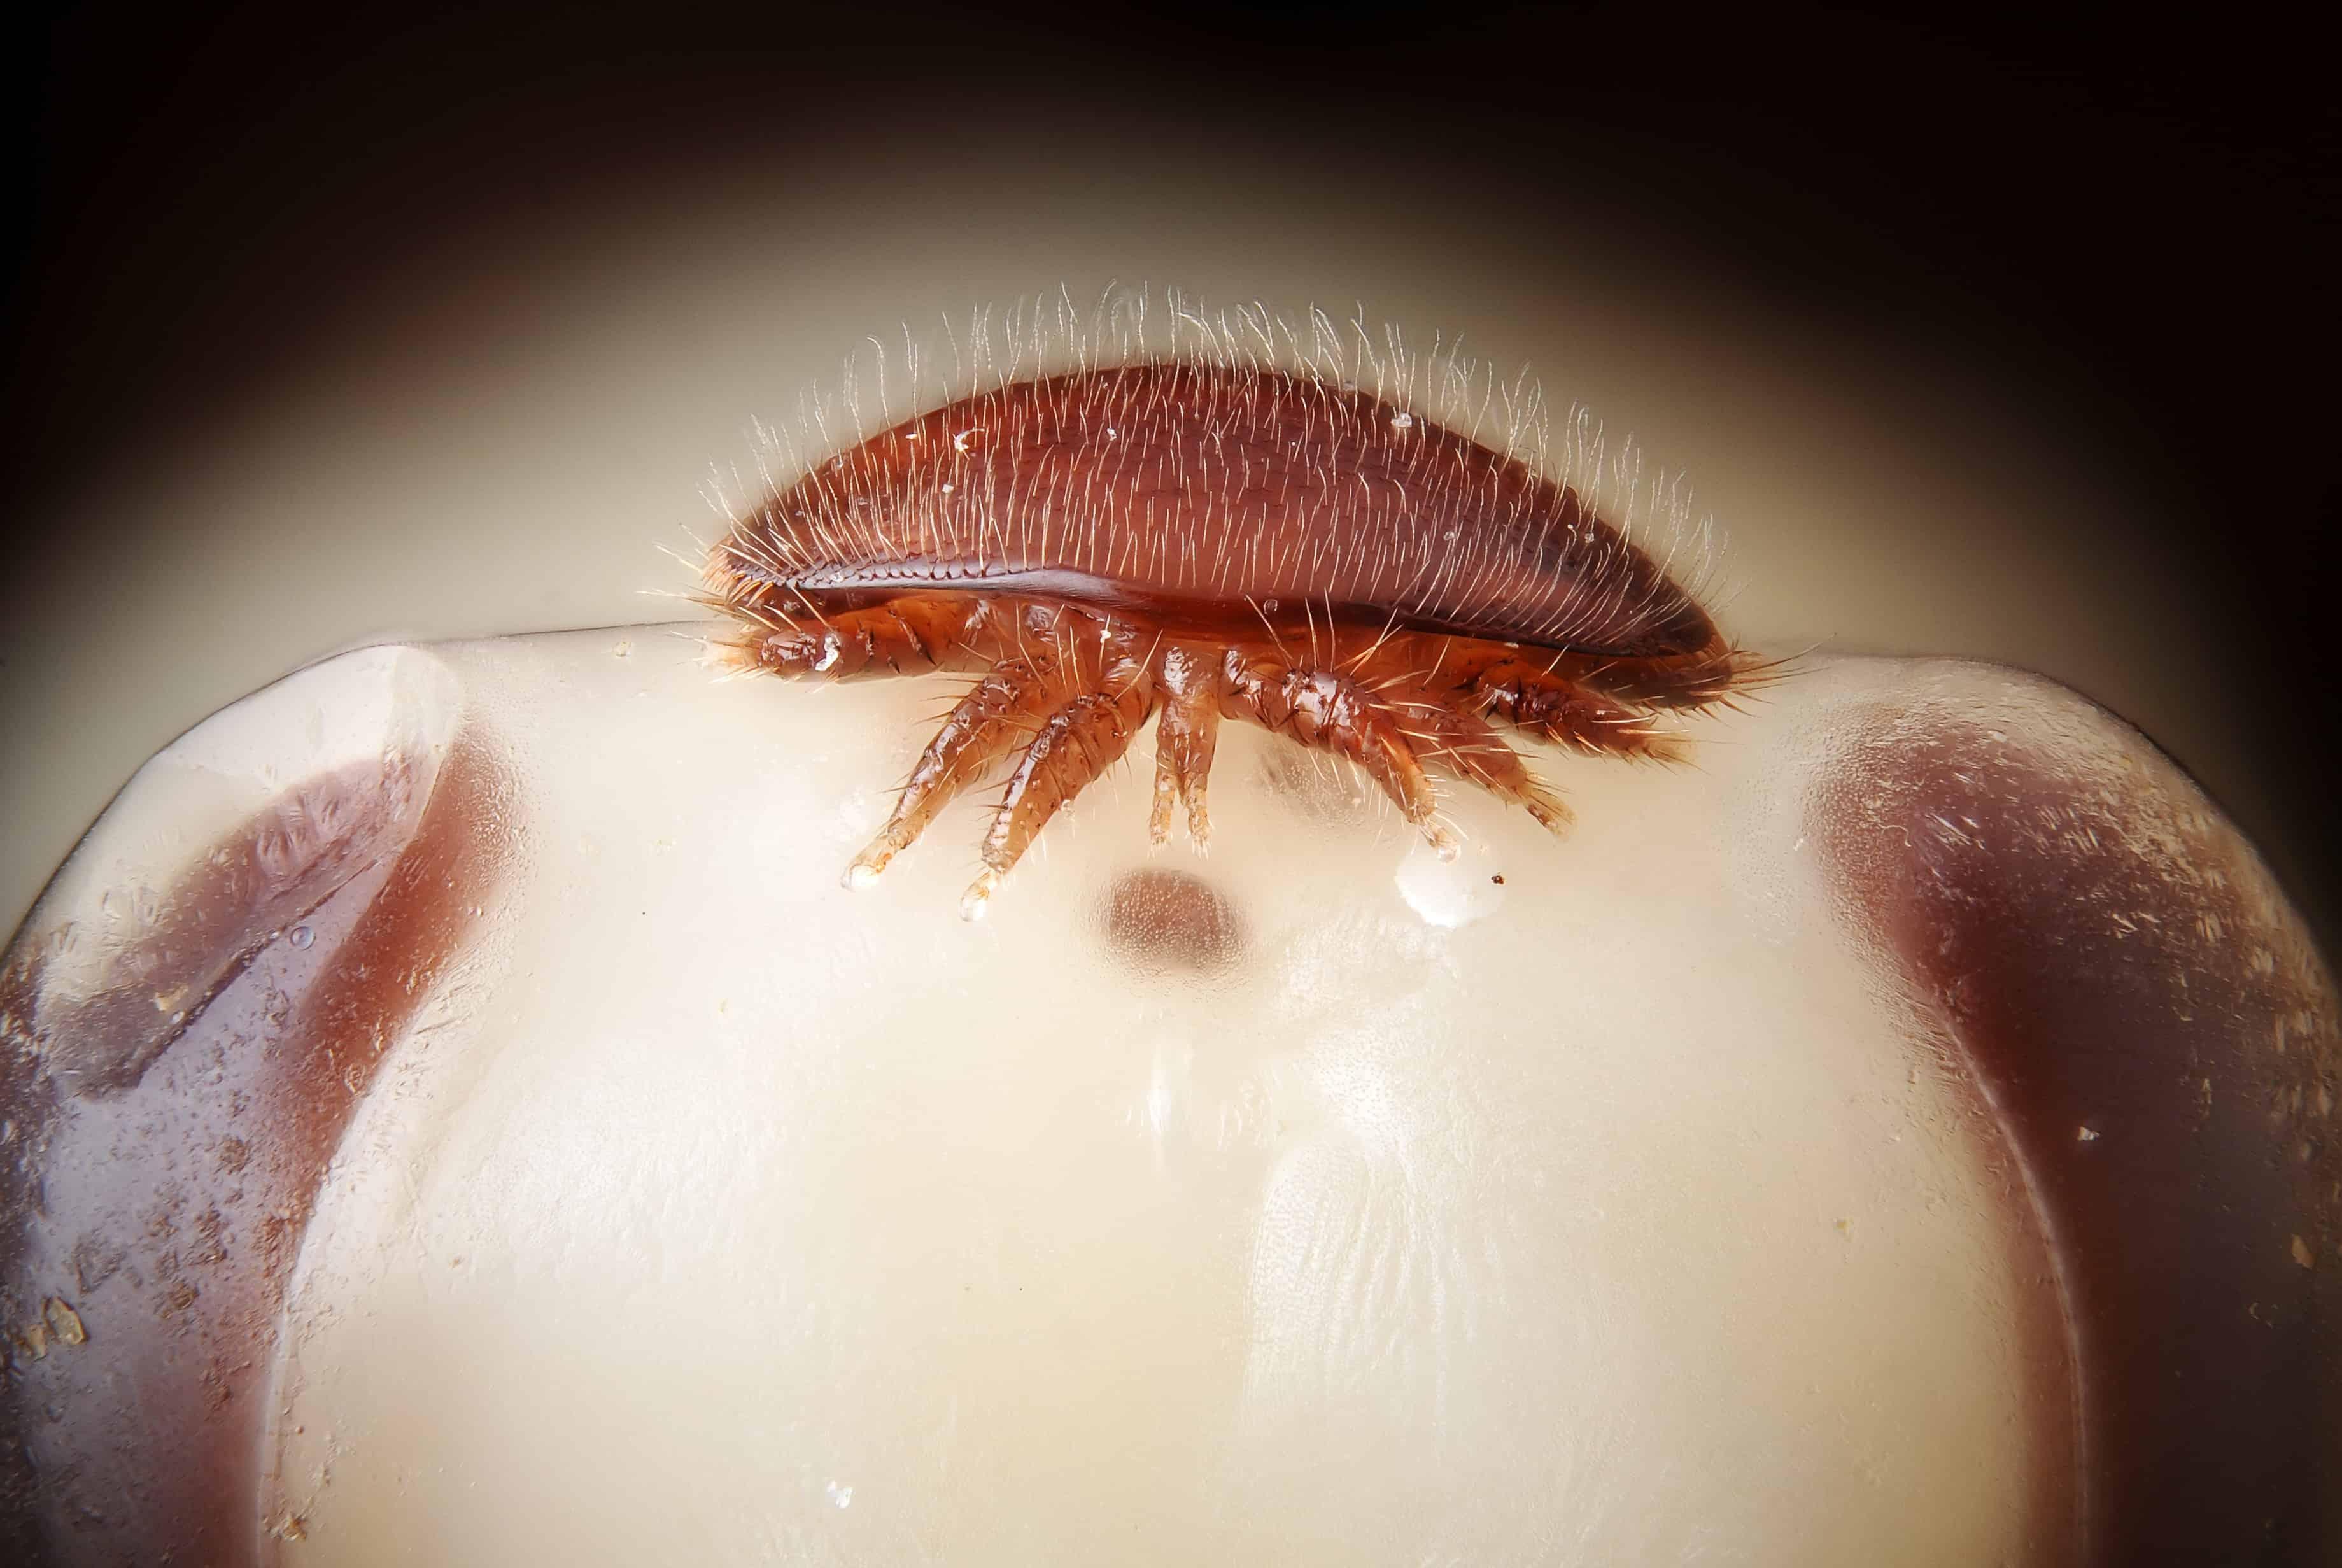 Varroa destructor on head of bee nymph